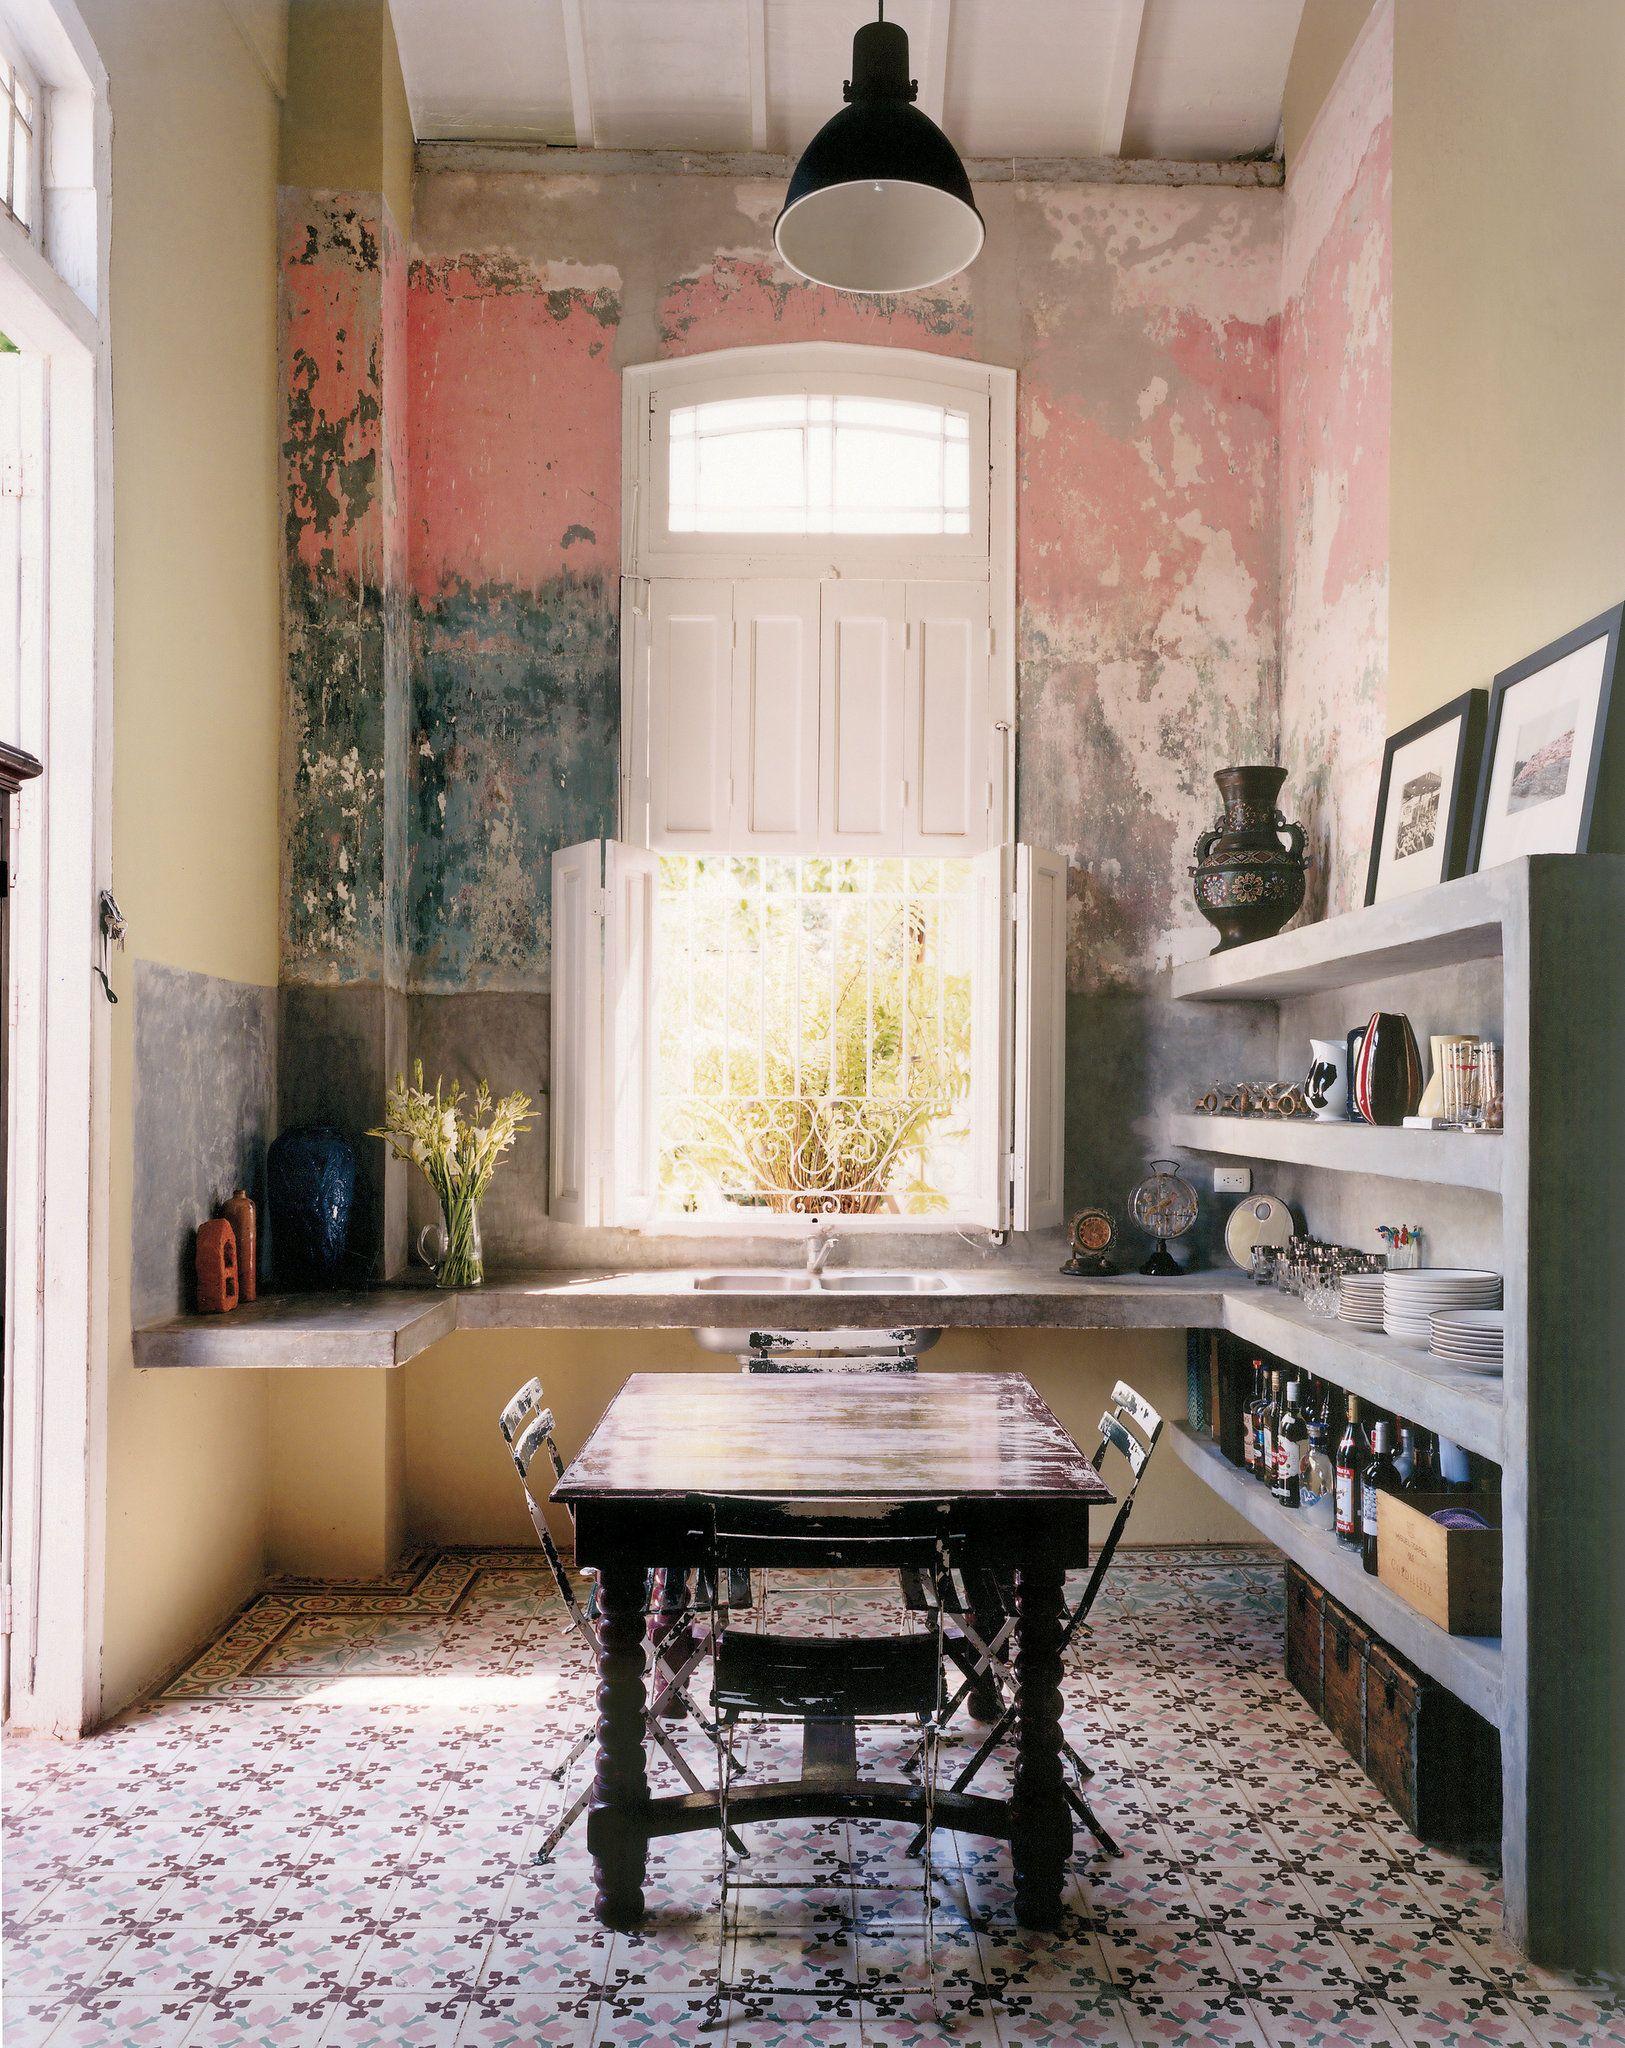 Ref despensa - piso +janela